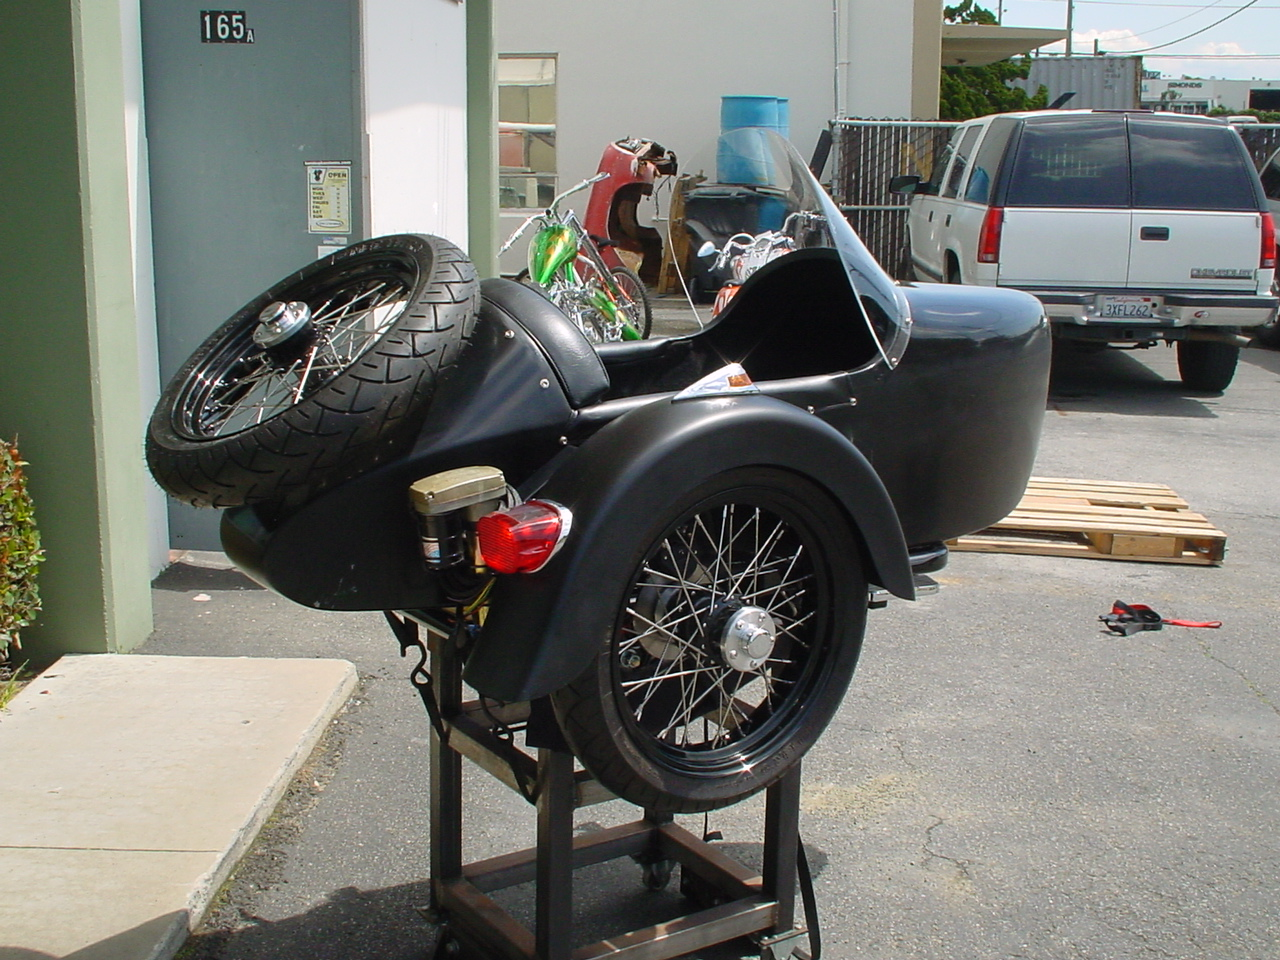 KCM Optional Sidecar